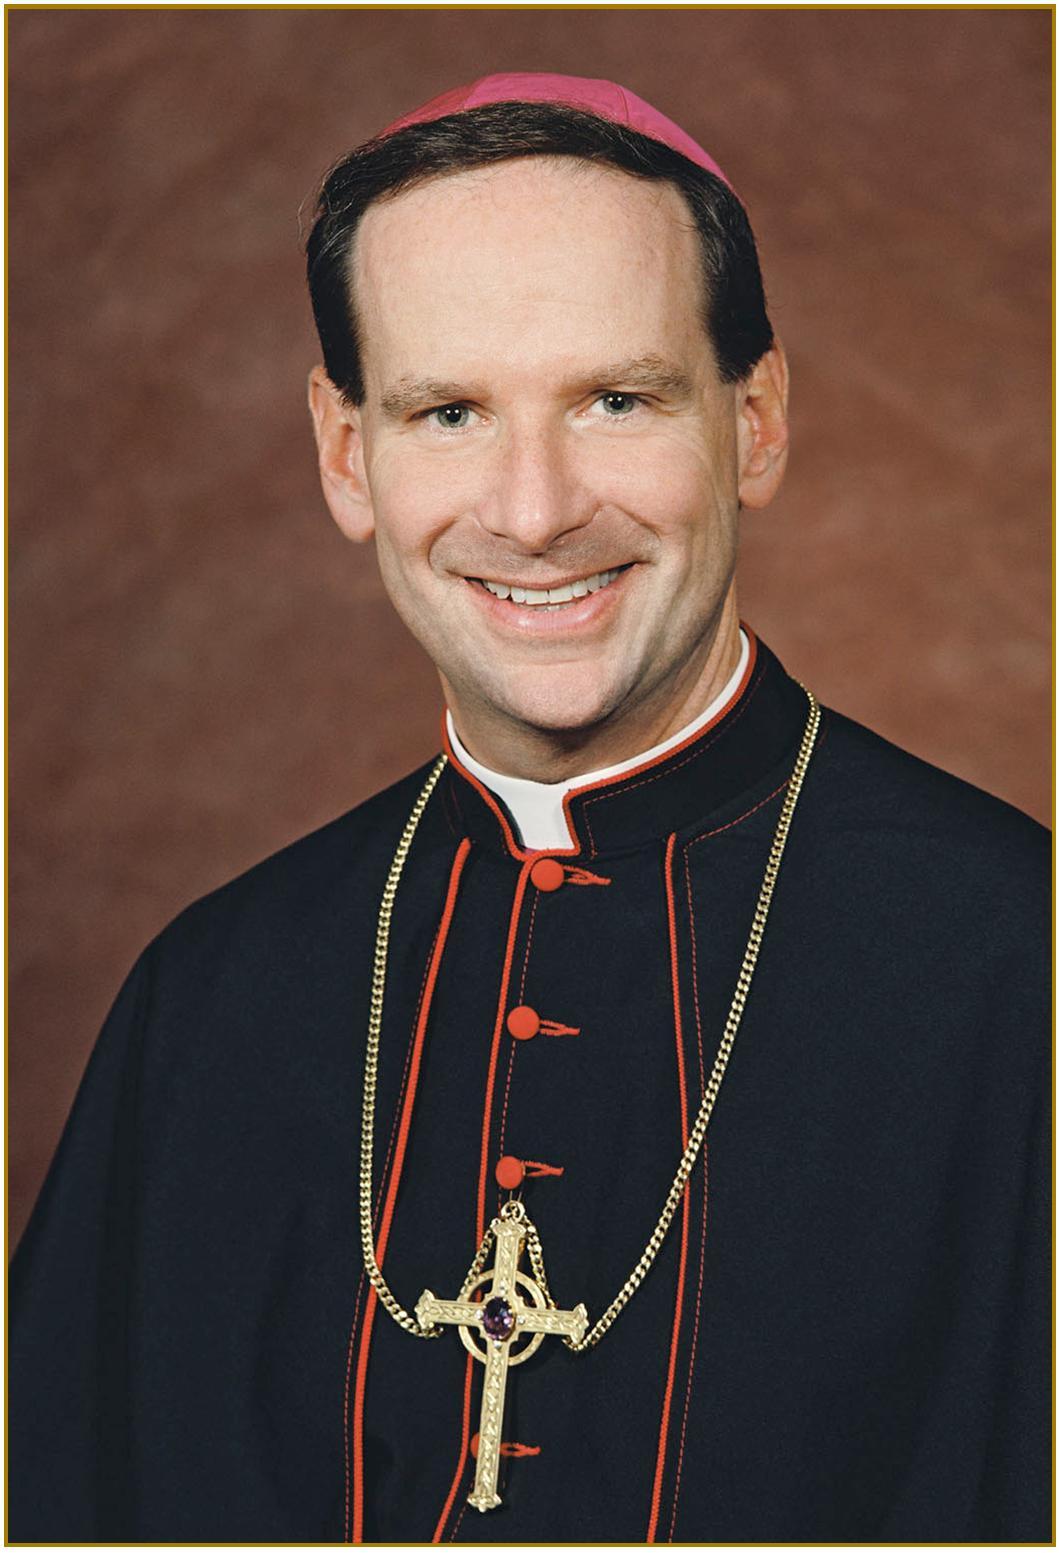 Diocese of arlington va